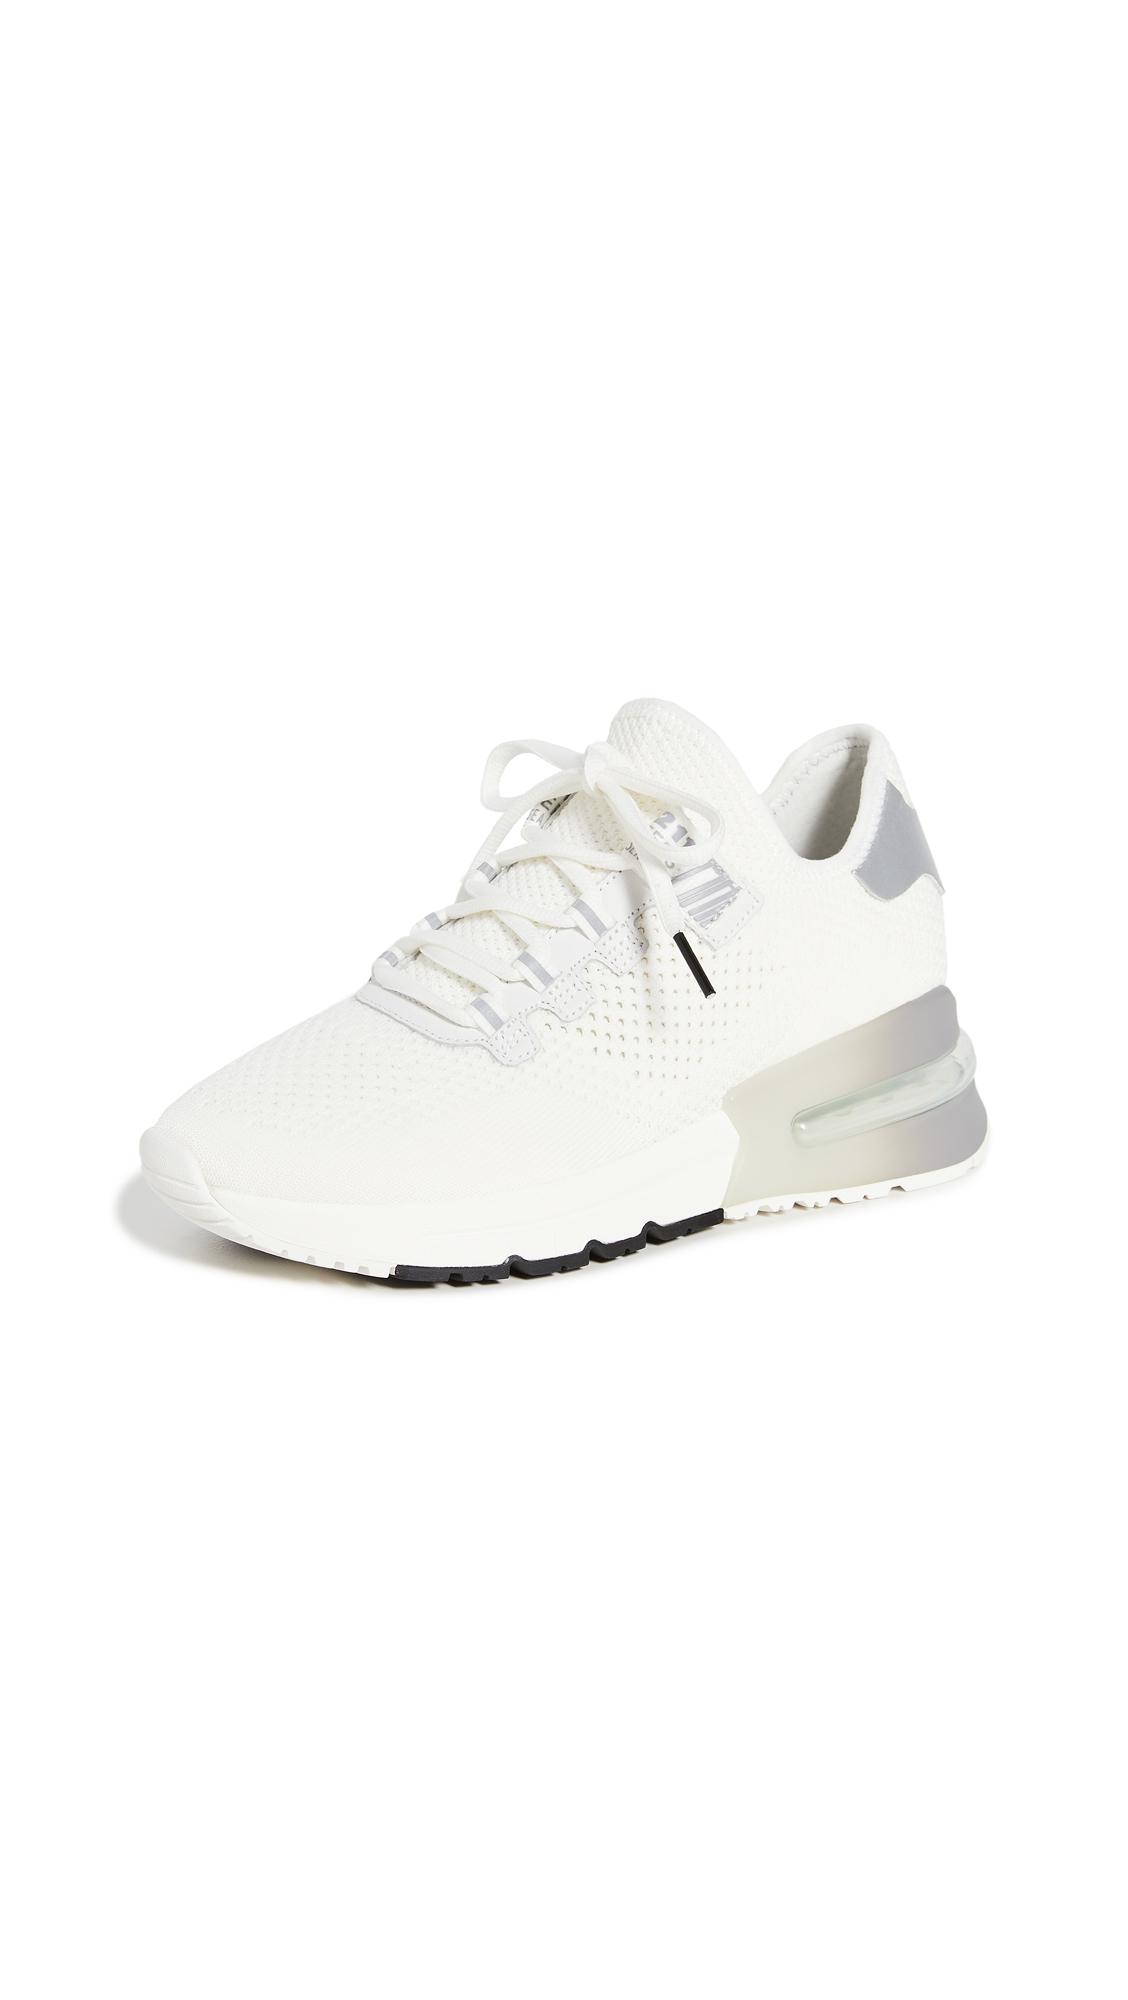 Buy Ash Krush Bis Sneakers online, shop Ash